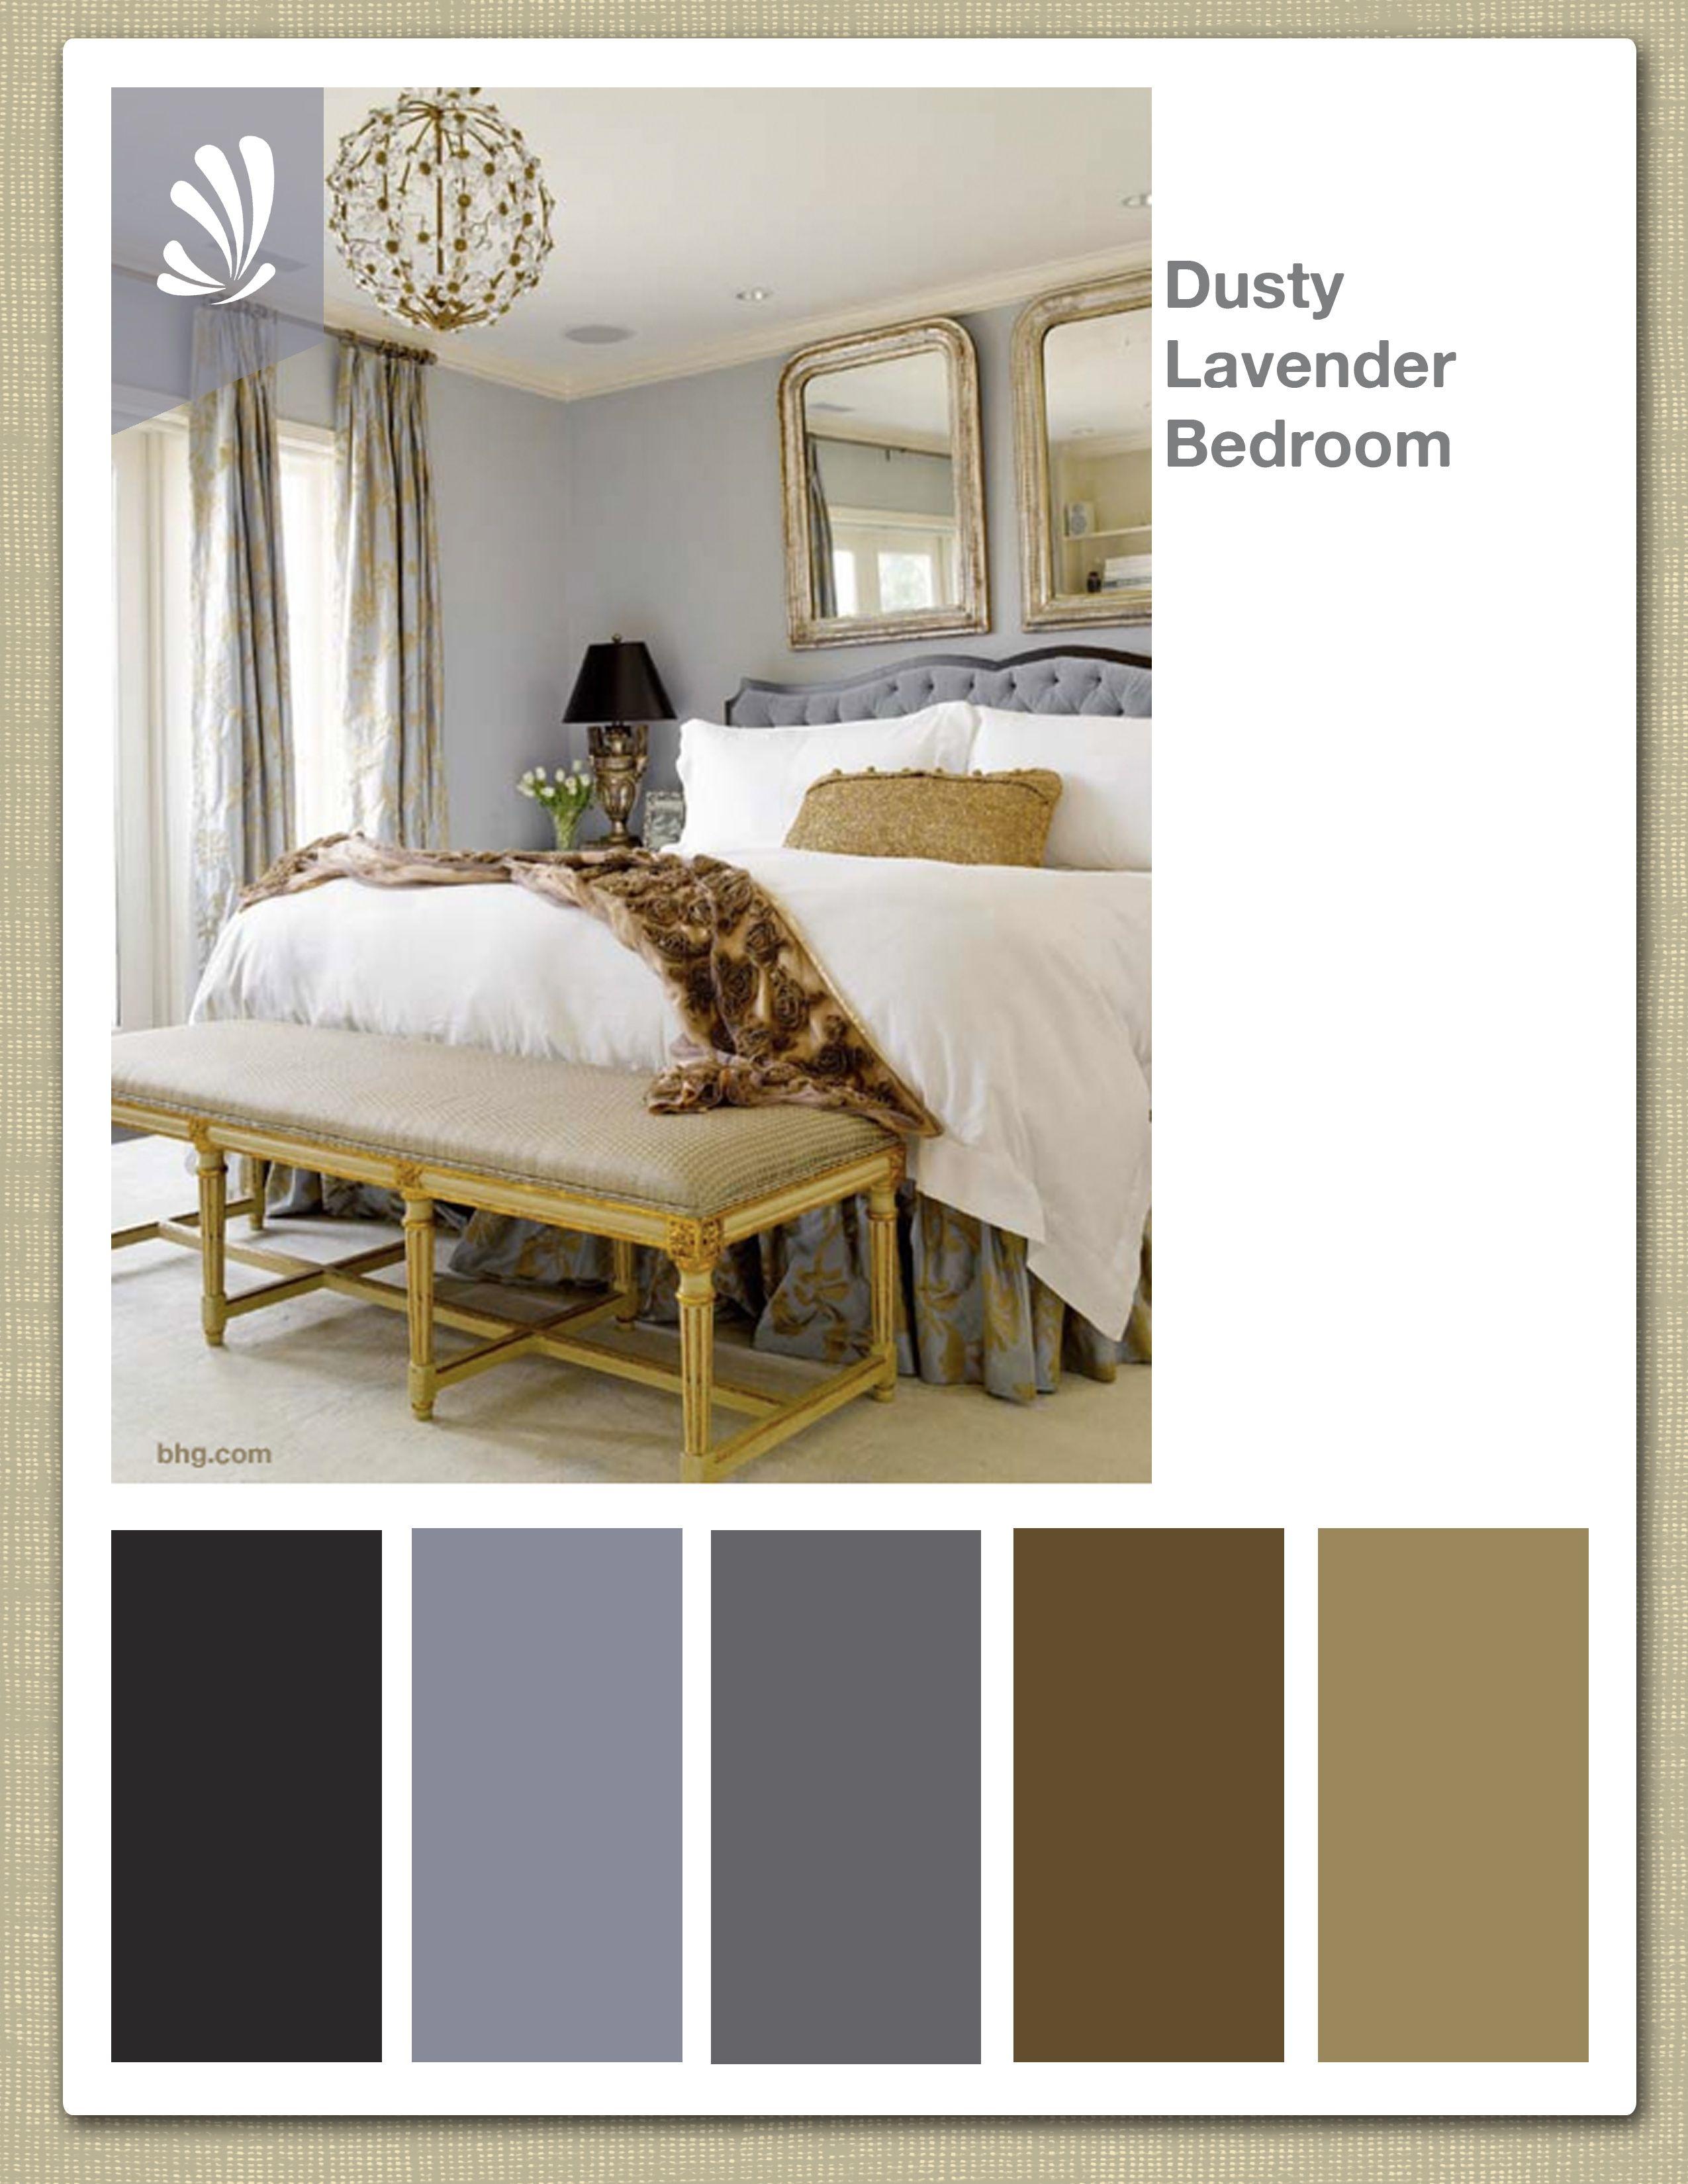 Charmant Our Bedroom? Lavender, Gold, Chestnut Color Palette. Make Your Bedroom A  Sanctuary!